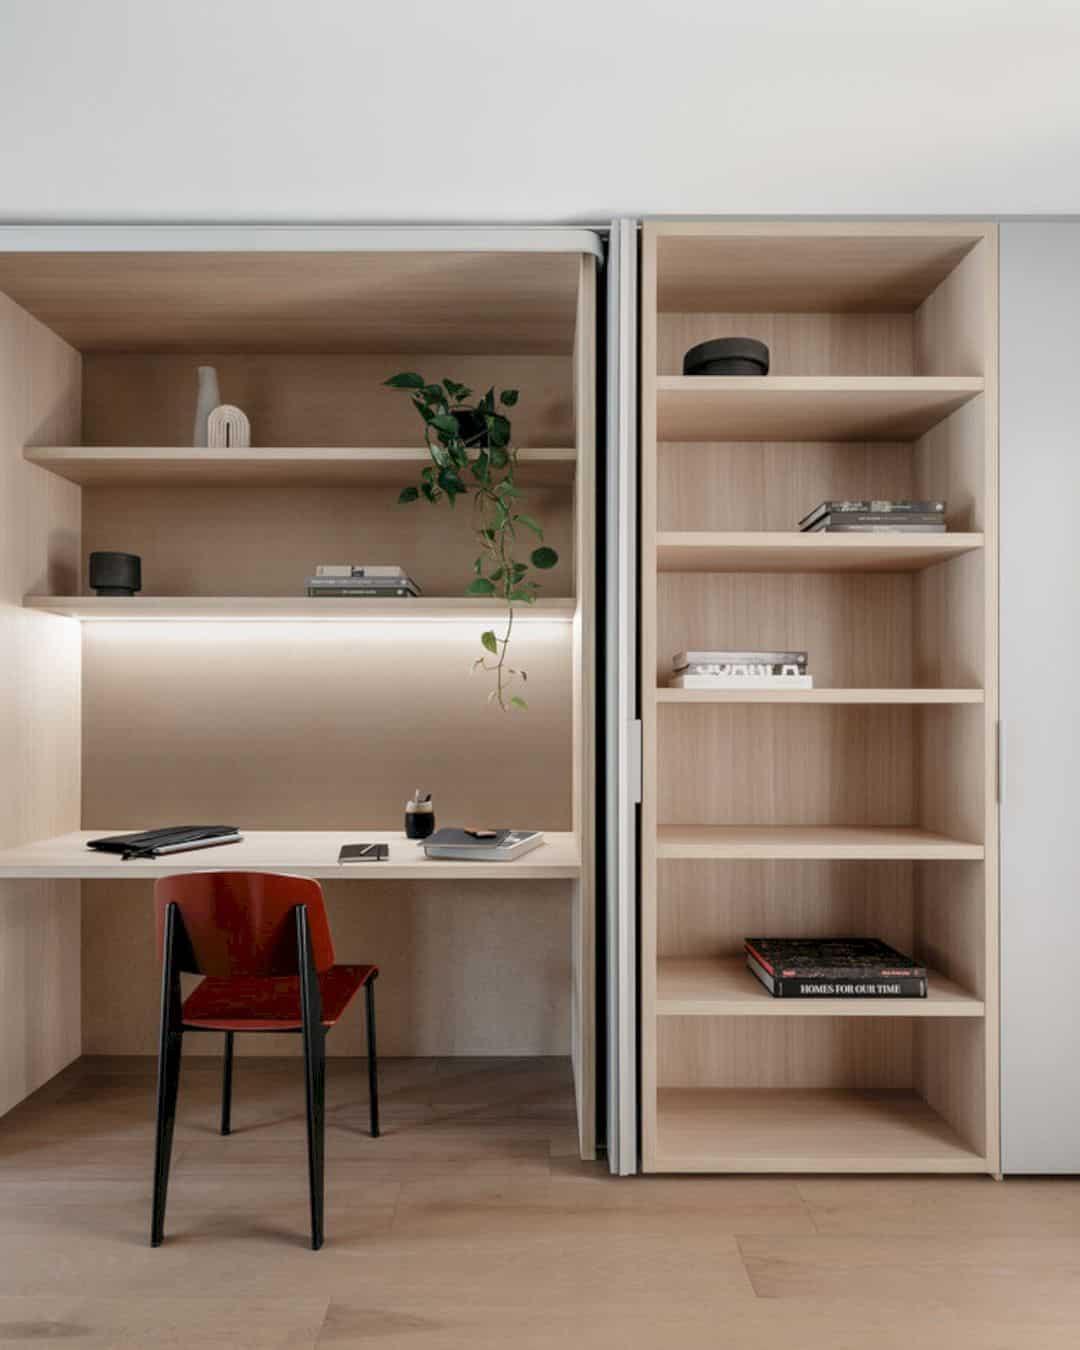 Carlton Apartment By Tom Eckersley Architects 8